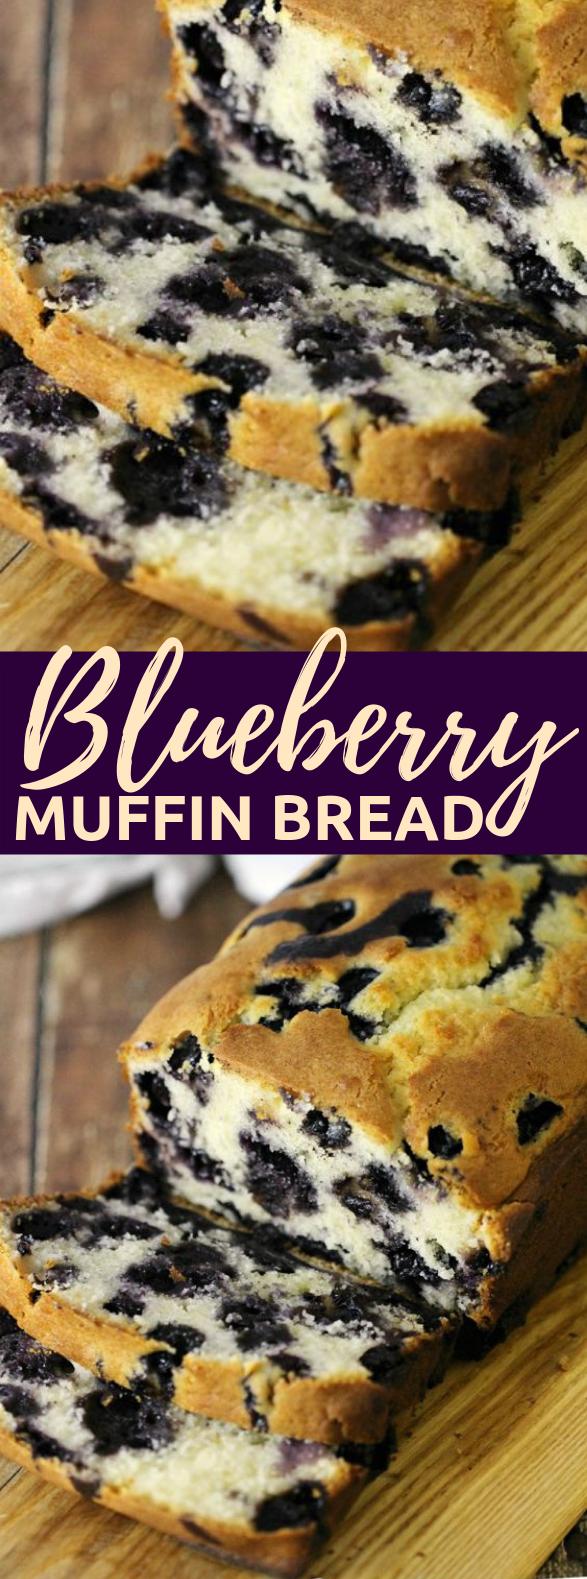 BLUEBERRY MUFFIN BREAD RECIPE #breakfast #cake